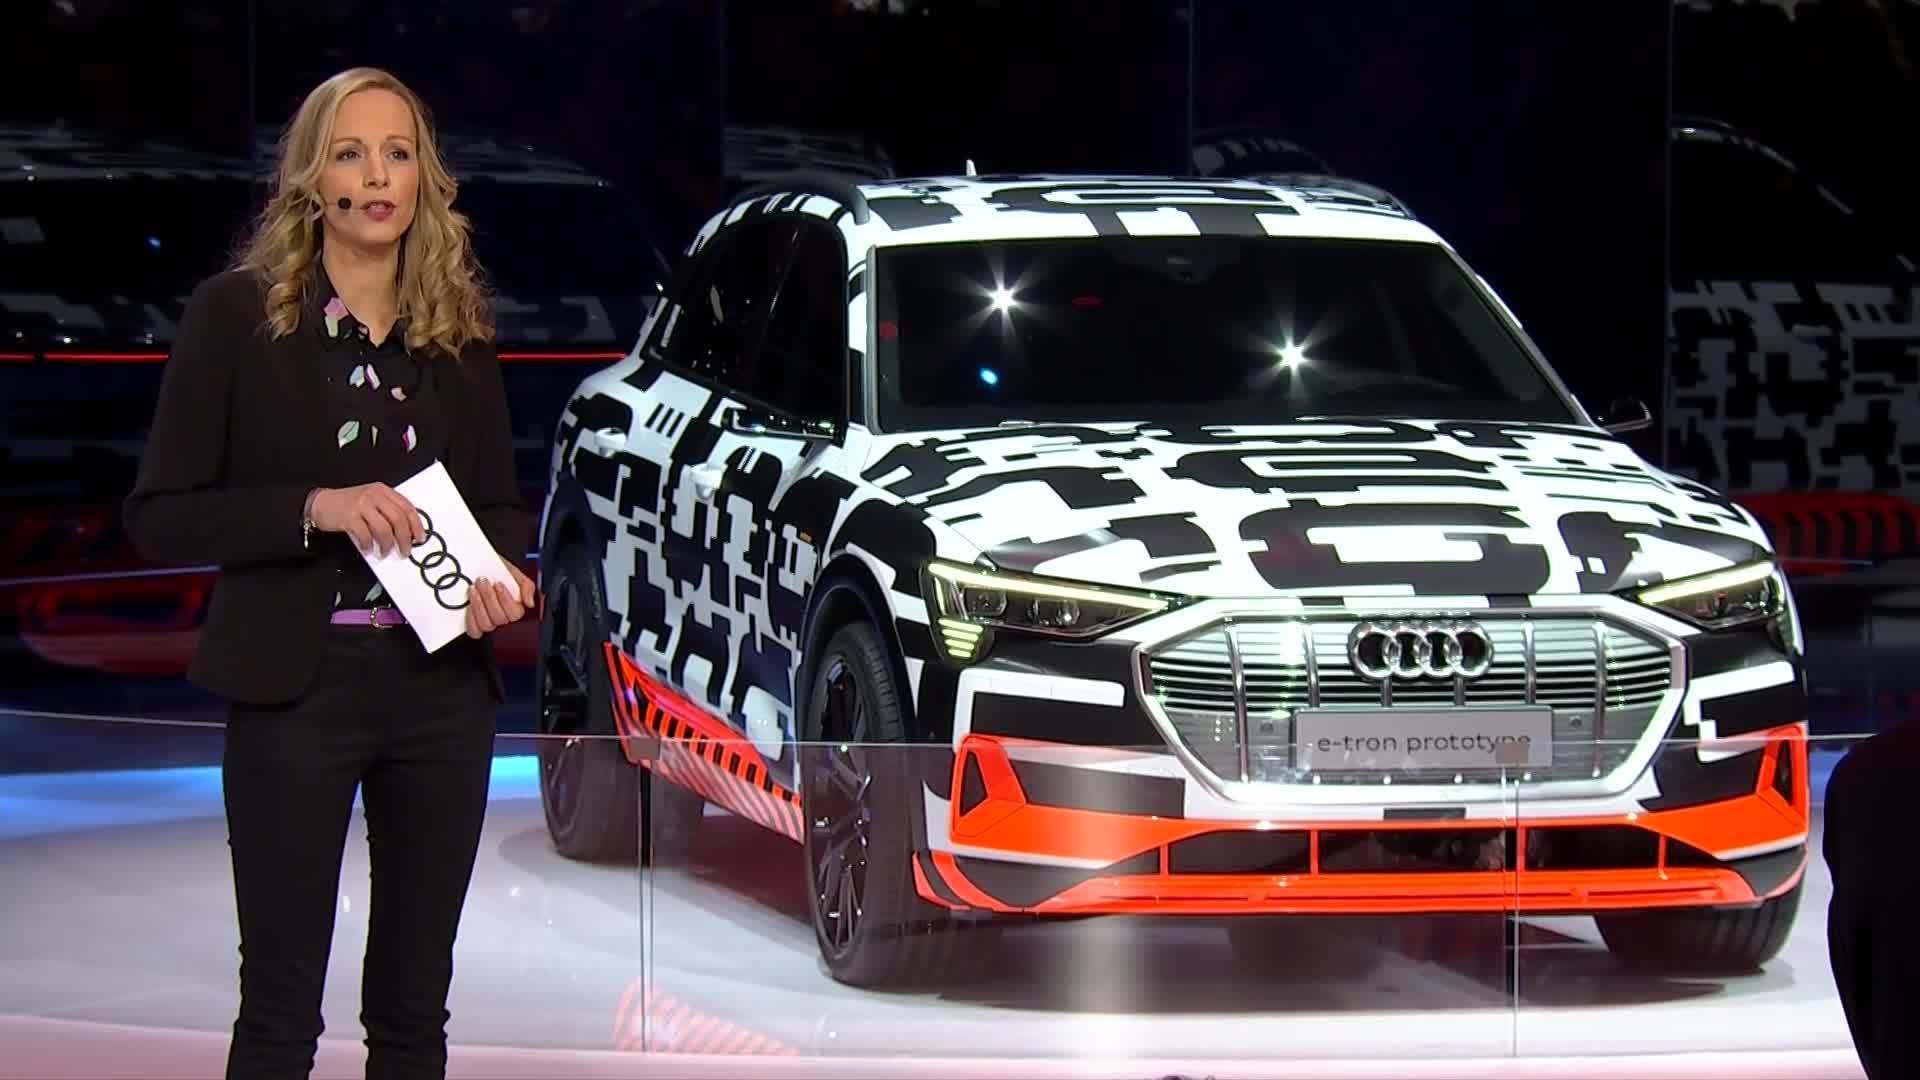 Audi A6 und Audi e-tron-Prototyp auf Genfer Salon